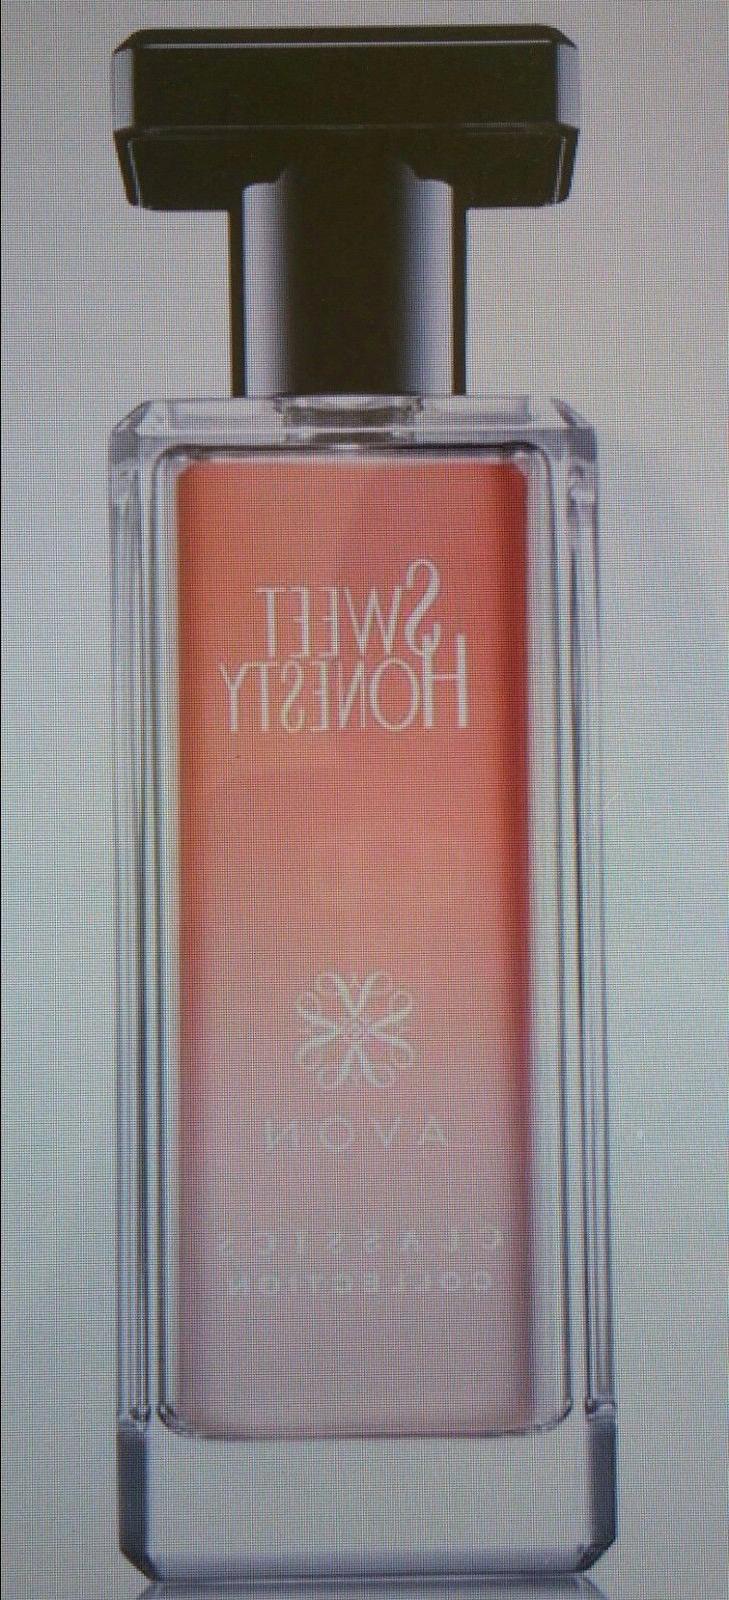 Sweet Cologne Spray Avon Fragrance 037-595